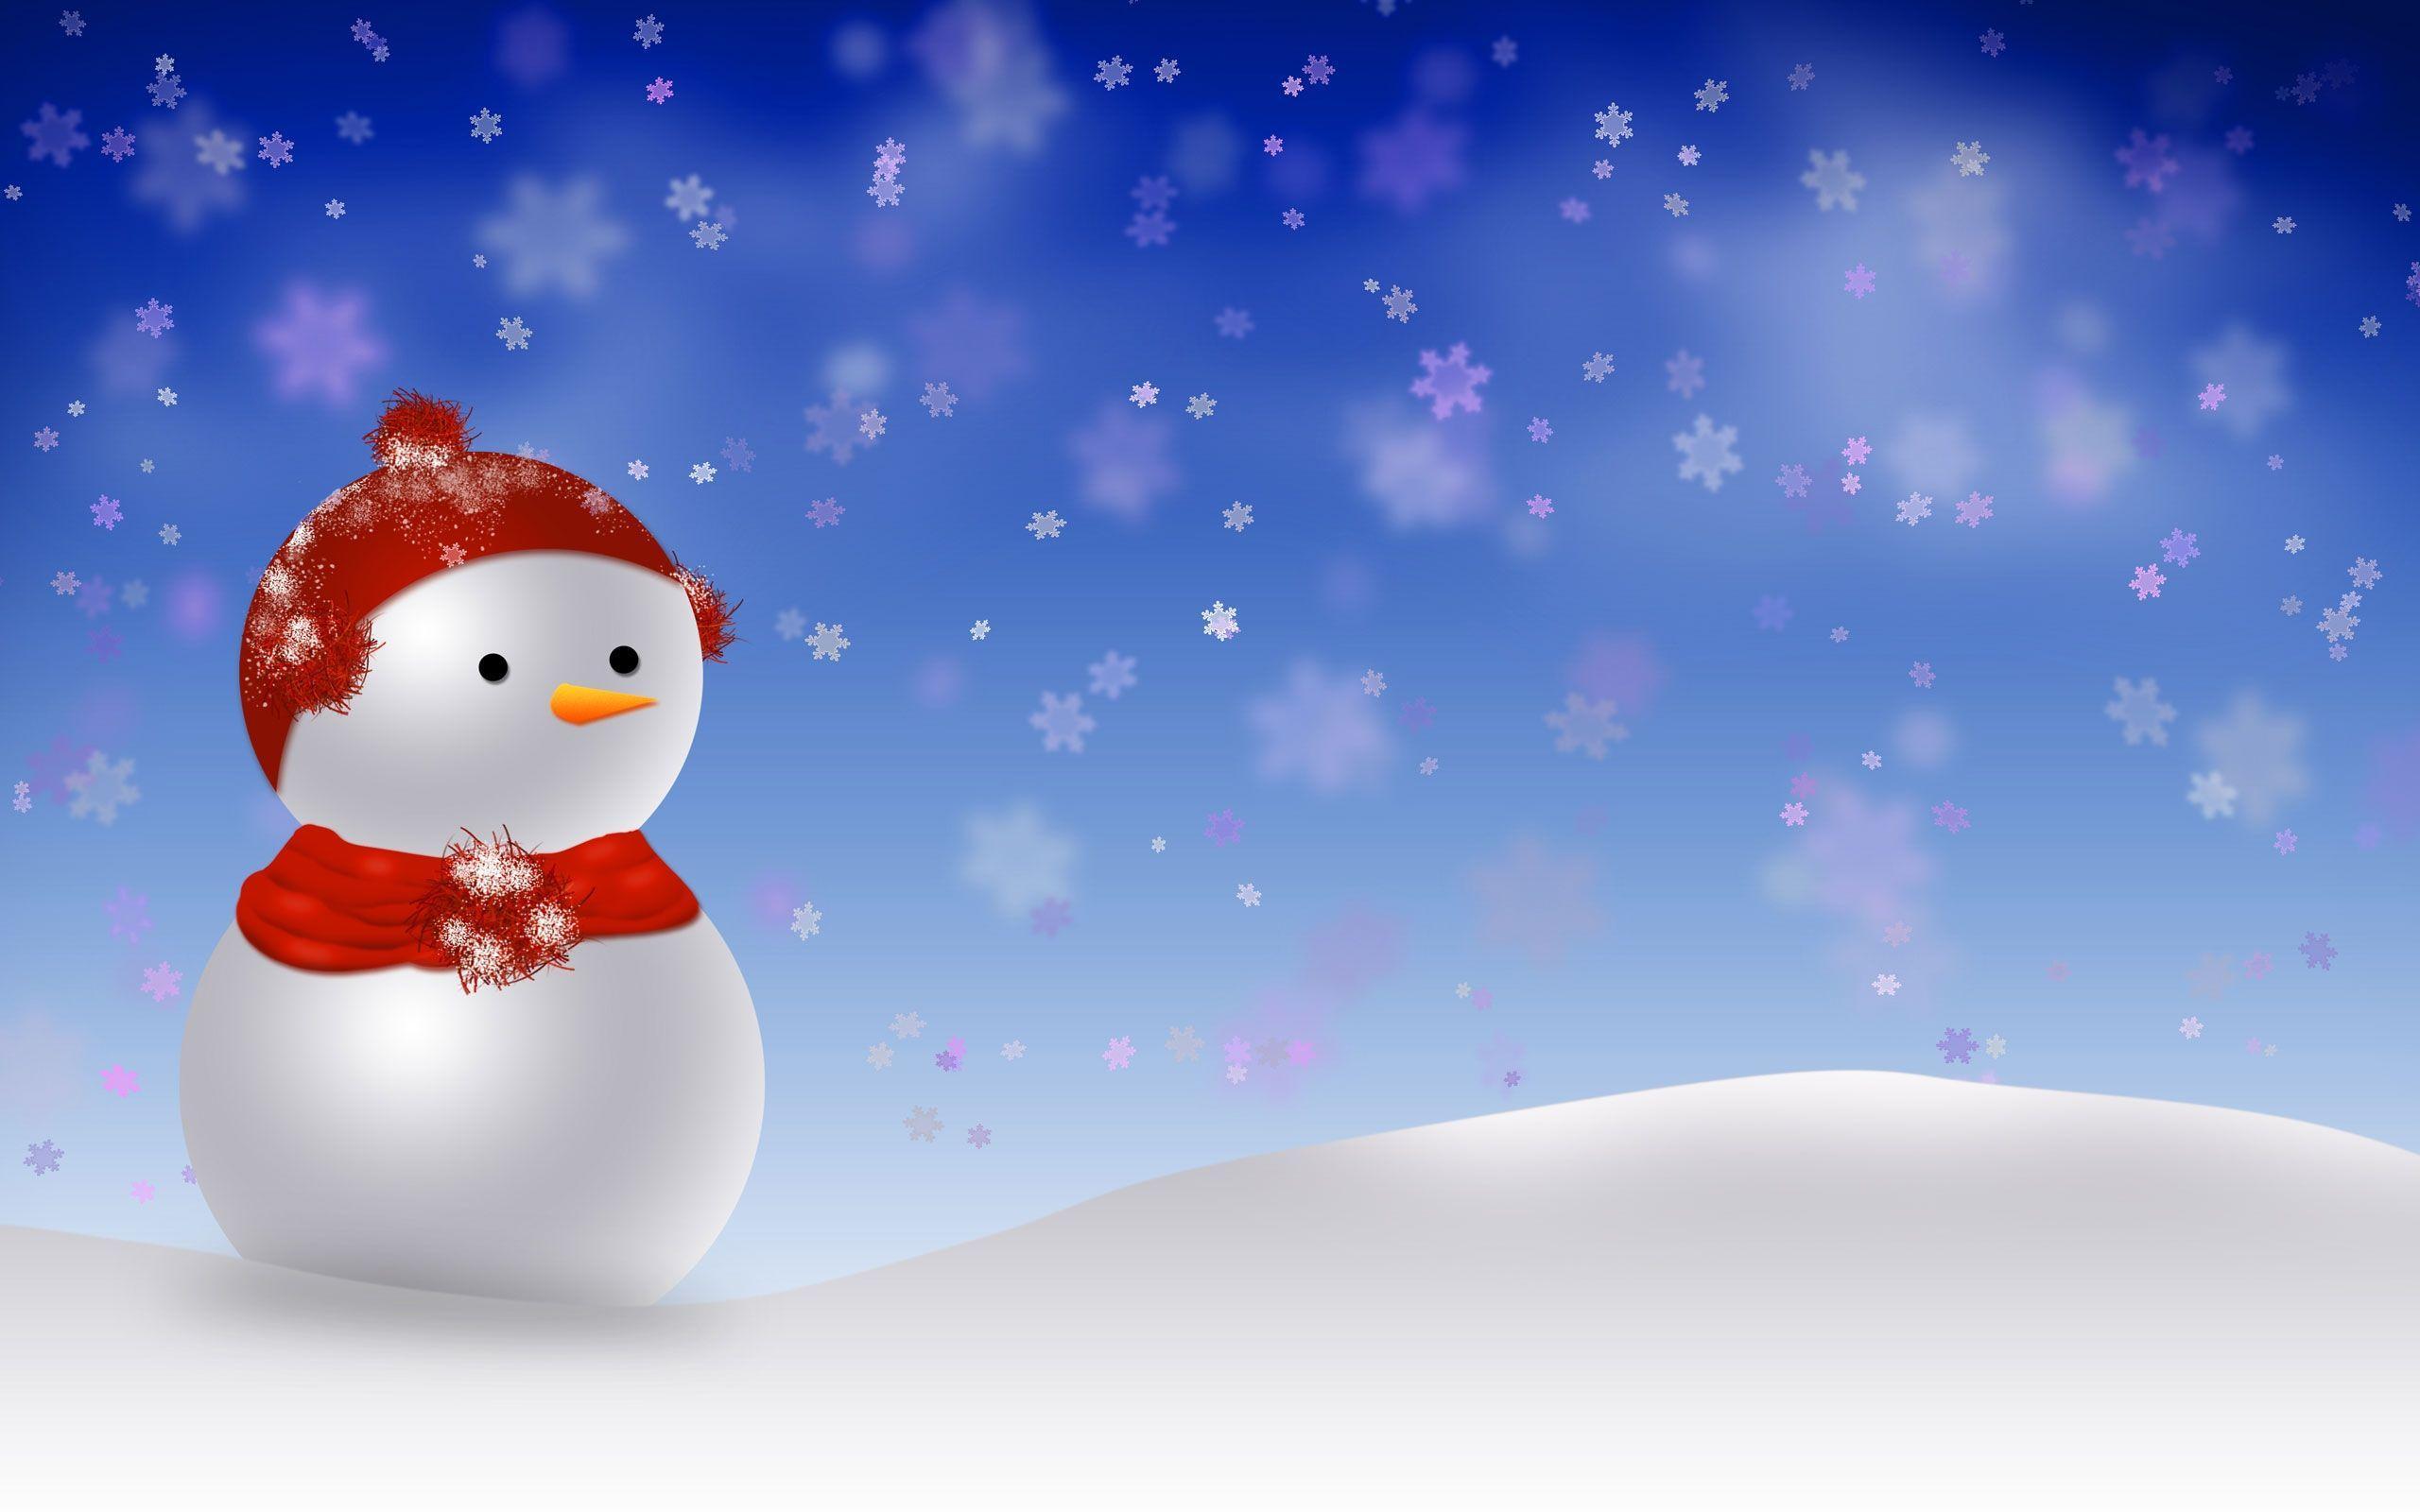 Cute Christmas Desktop Backgrounds 2560x1600